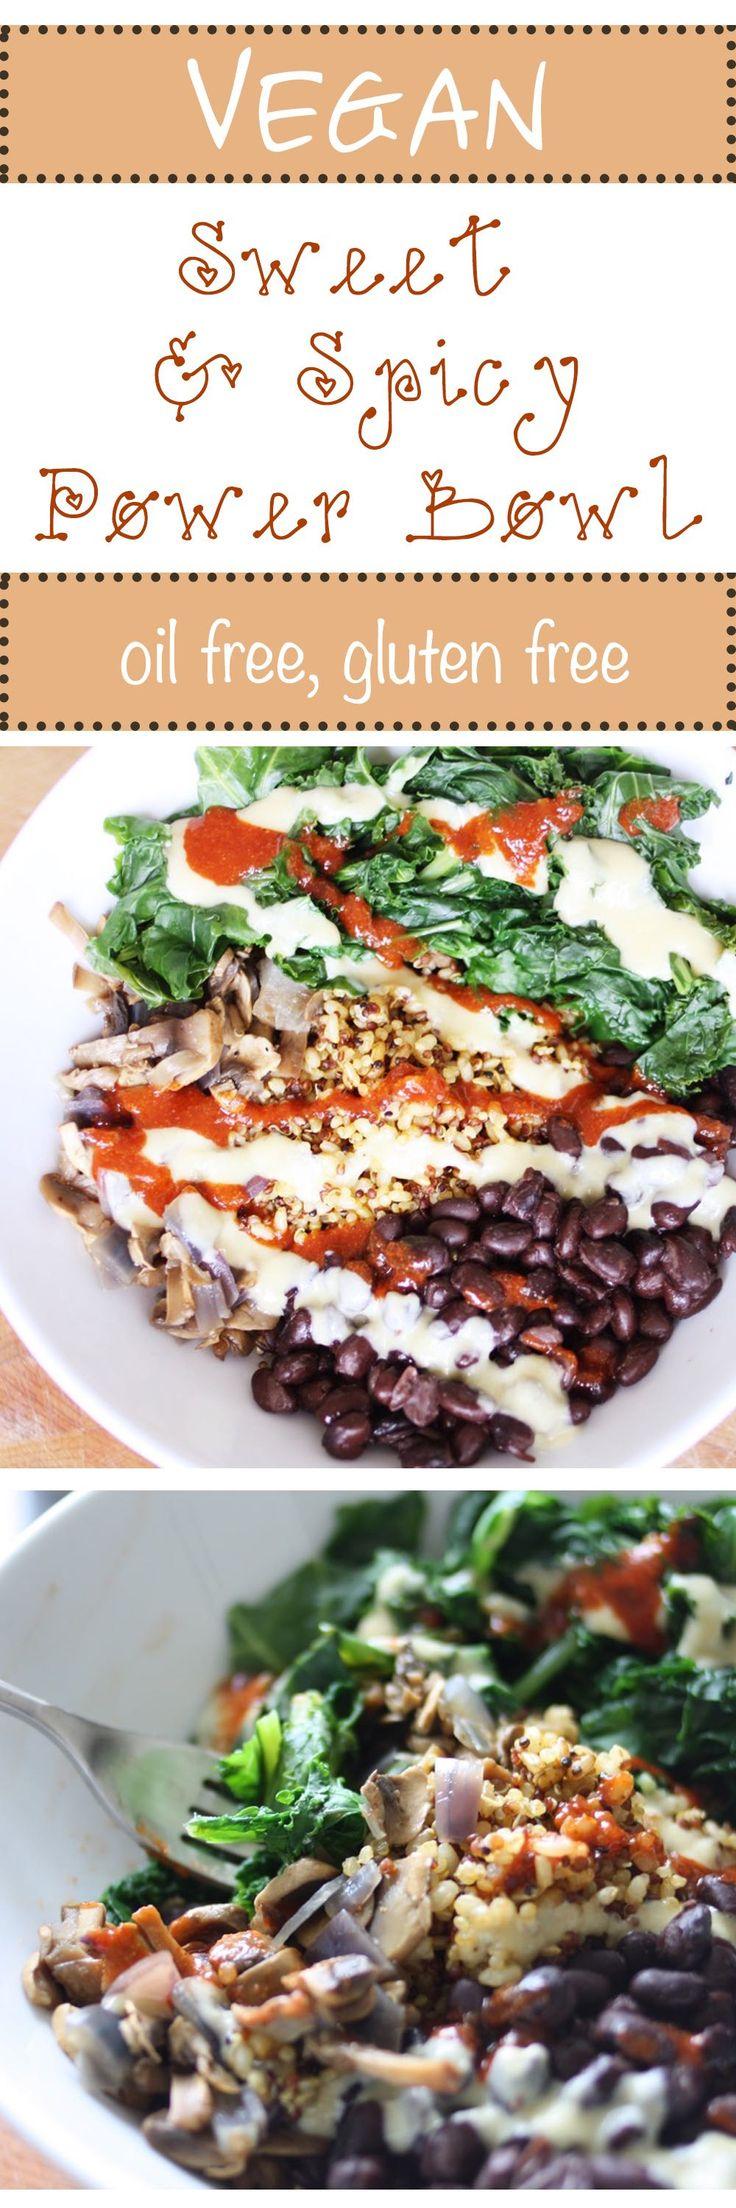 Sweet and Spicy Power Bowl | www.veggiesdontbite.com | #vegan #plantbased #glutenfree #oilfree